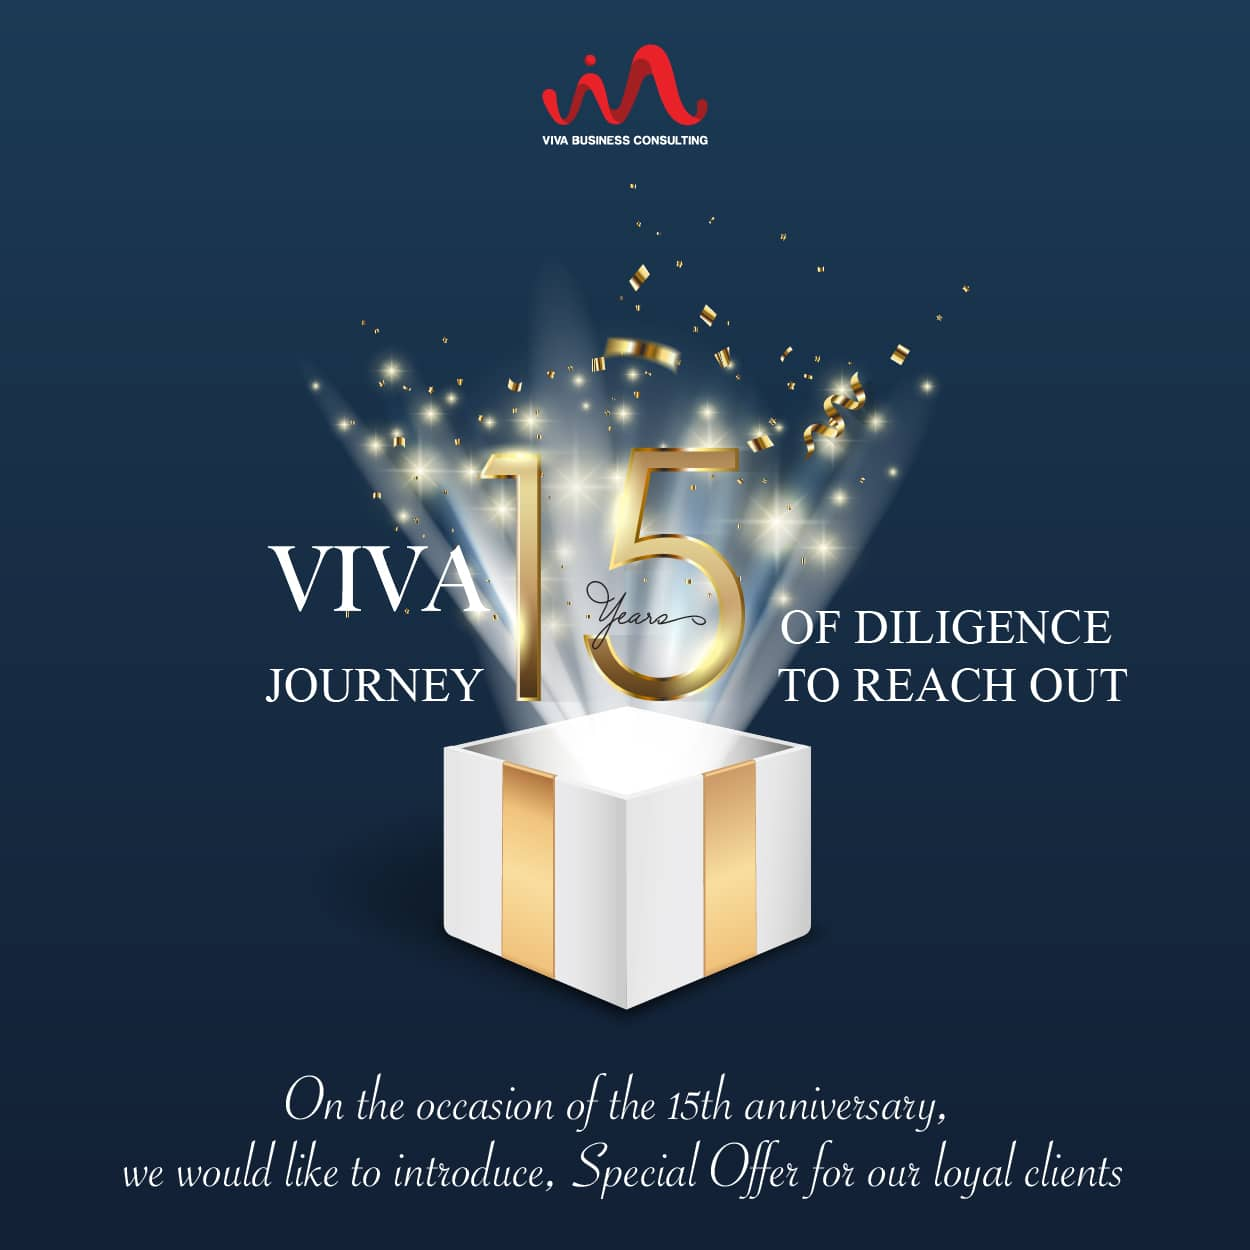 15 Years VIVA Anniversary promotion